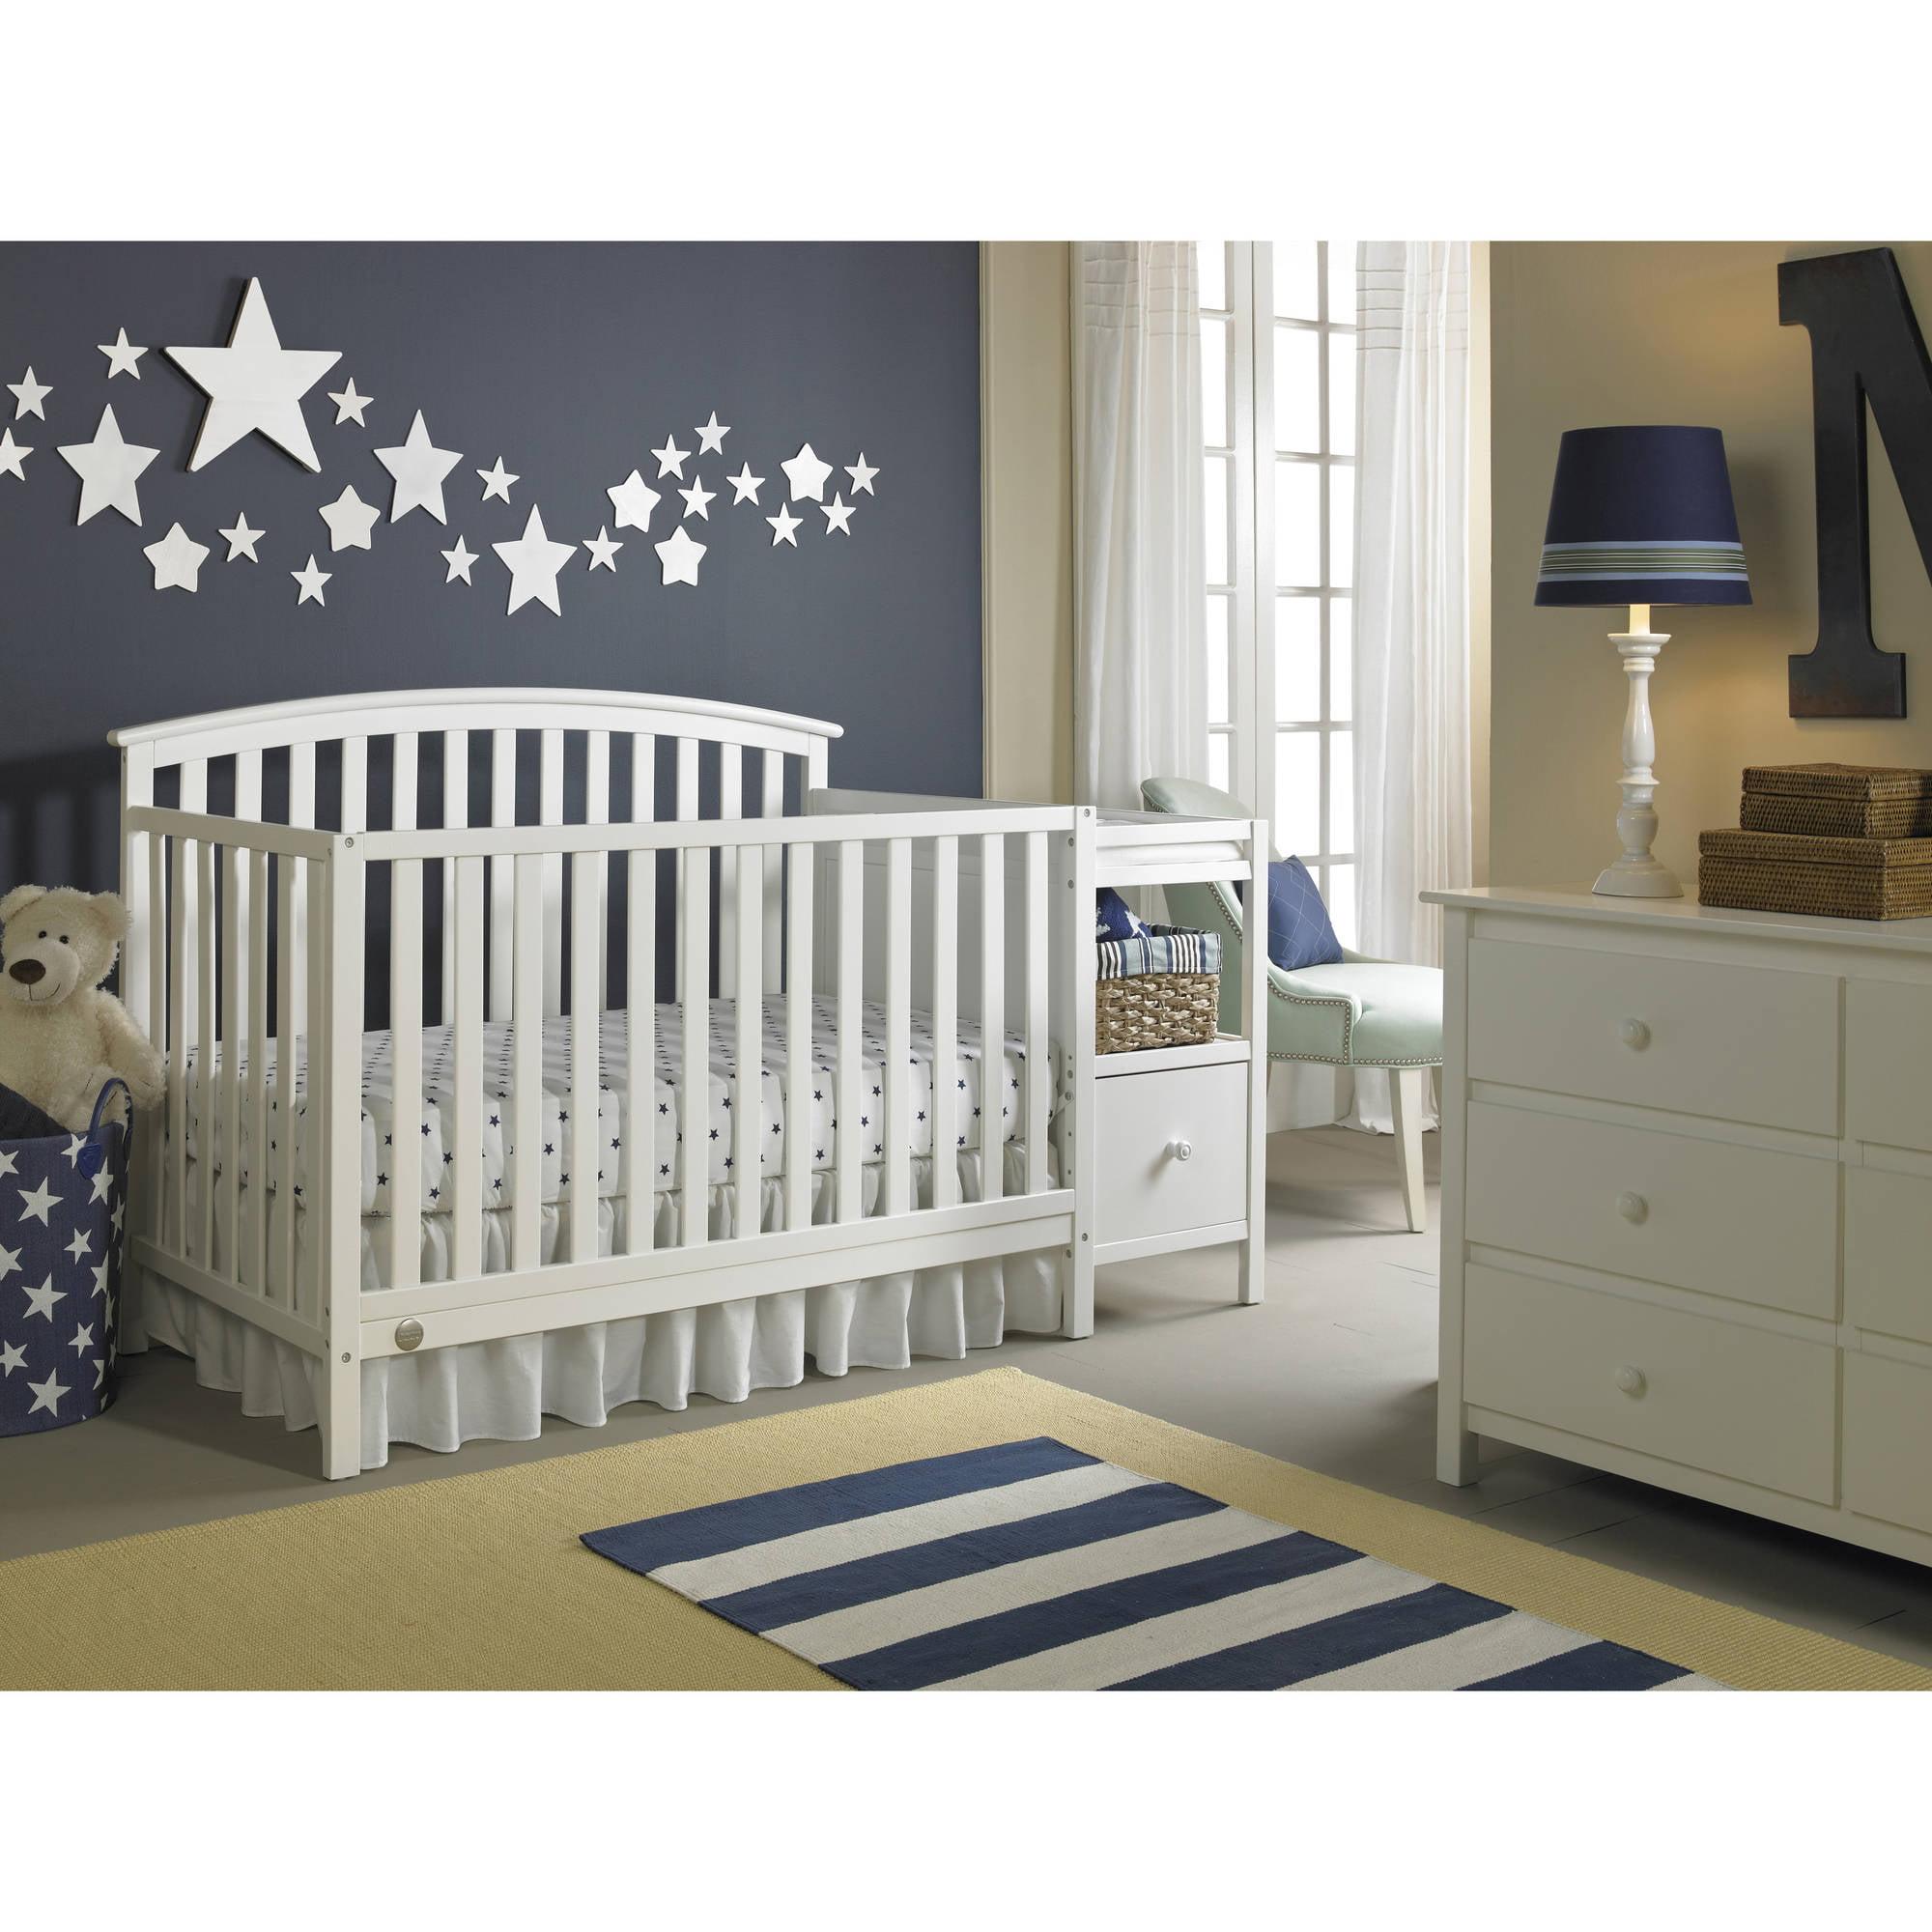 Fisher Price Huntington 4 In 1 Convertible Crib N Changer